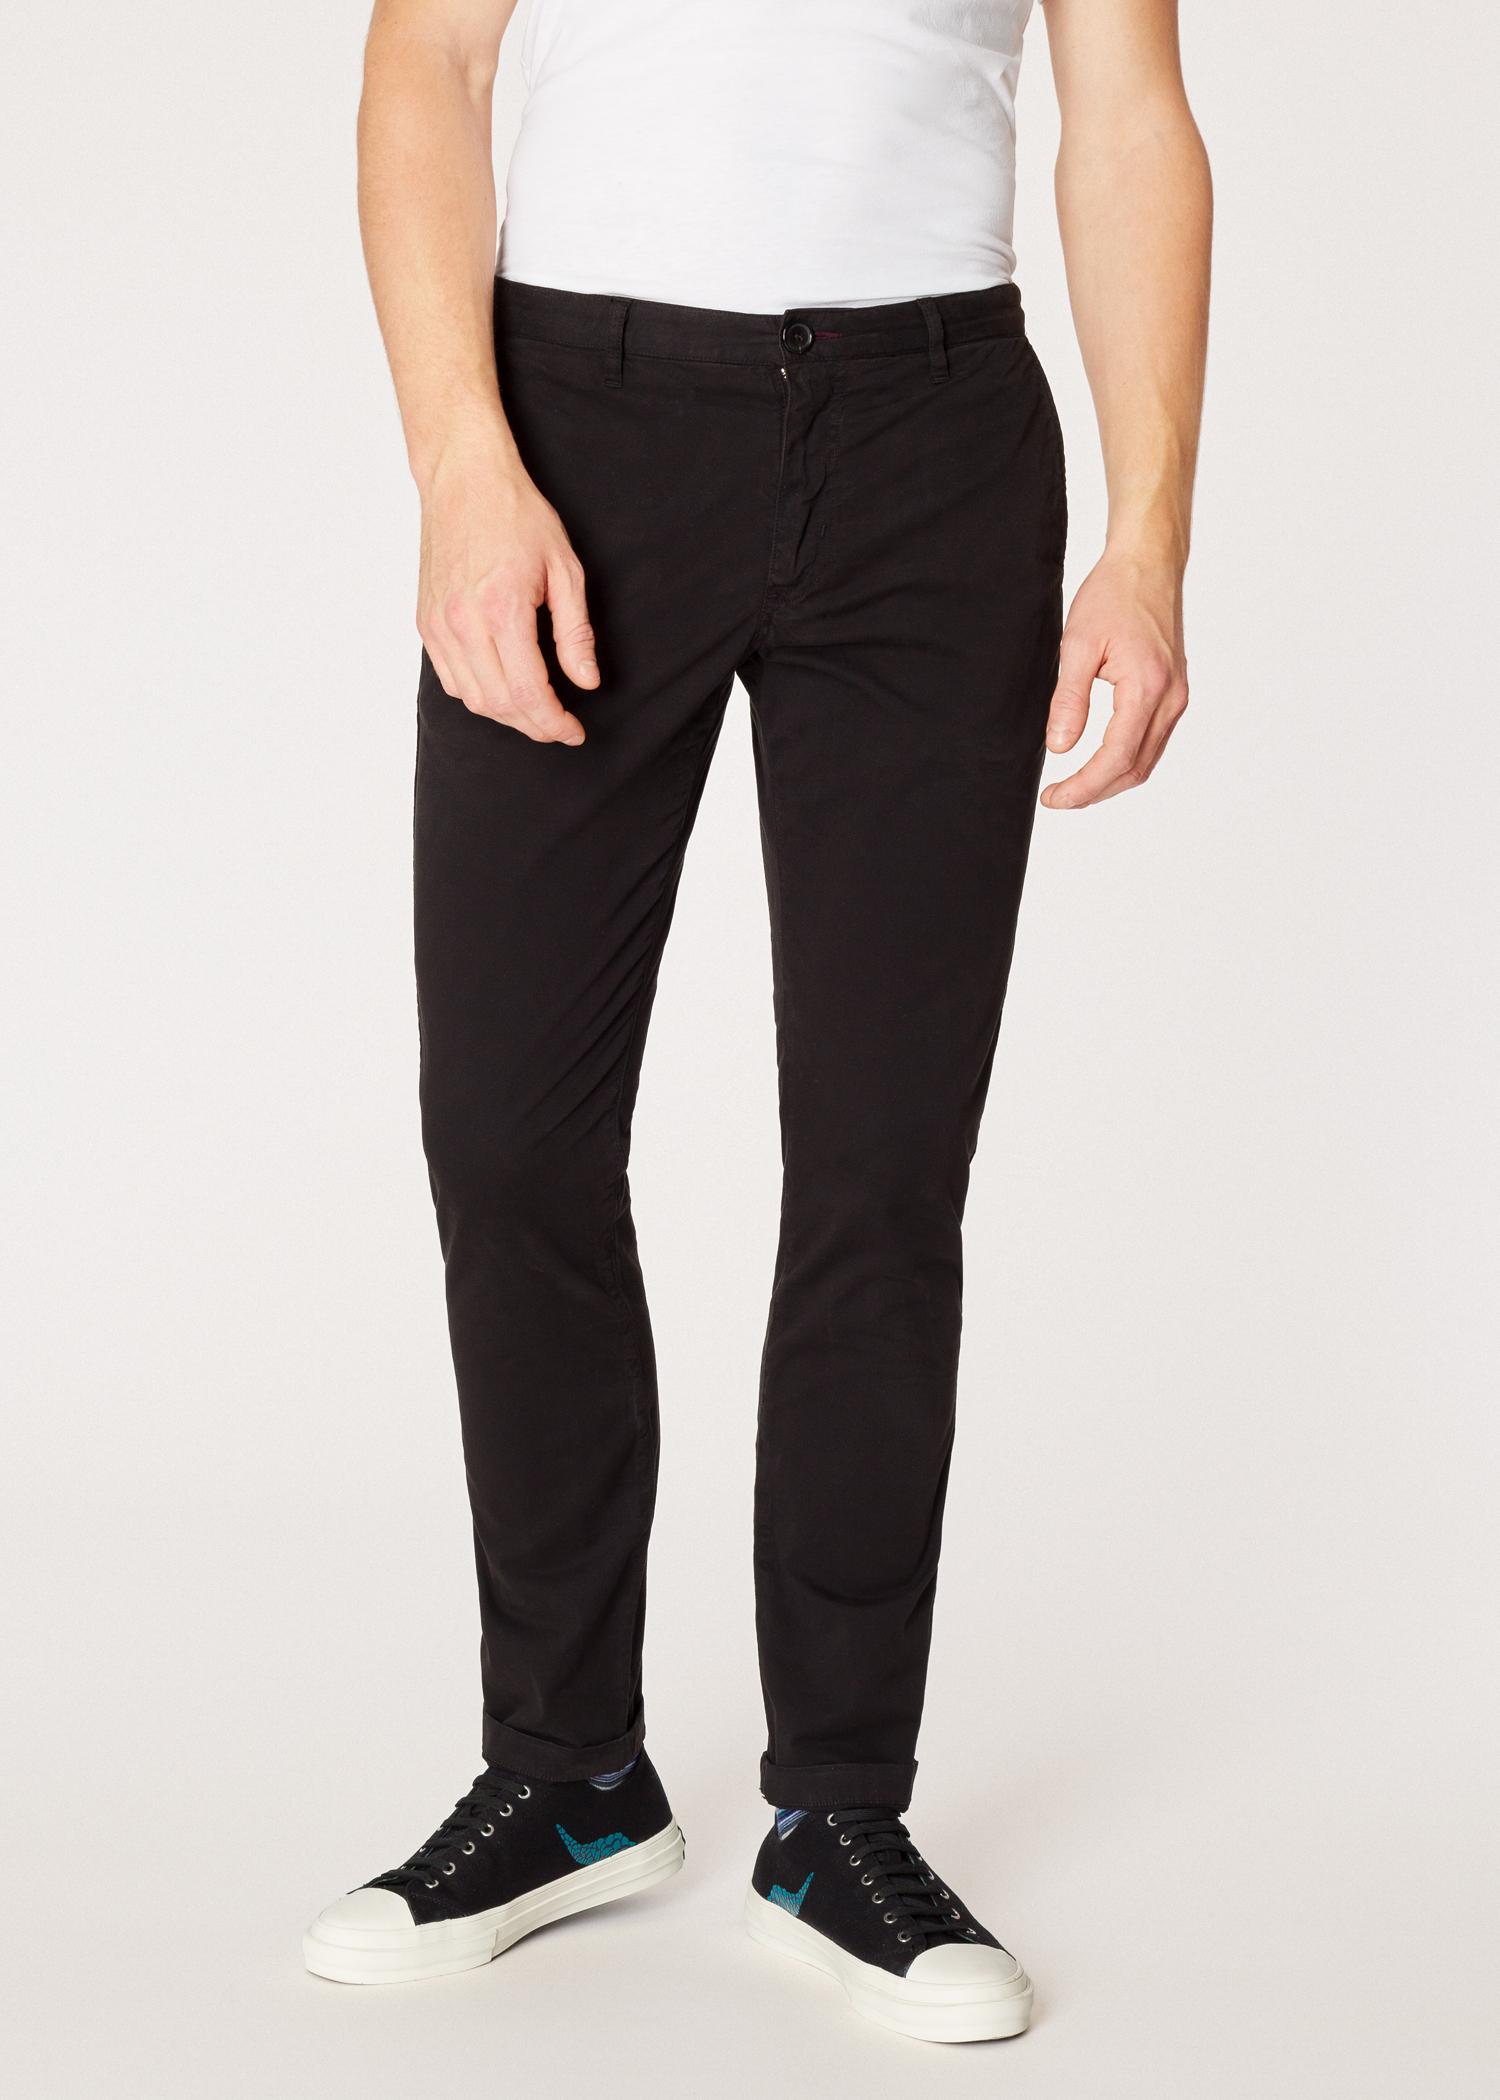 494492c0f16c19 Model front close up - Men's Slim-Fit Black Stretch Pima-Cotton Chinos Paul